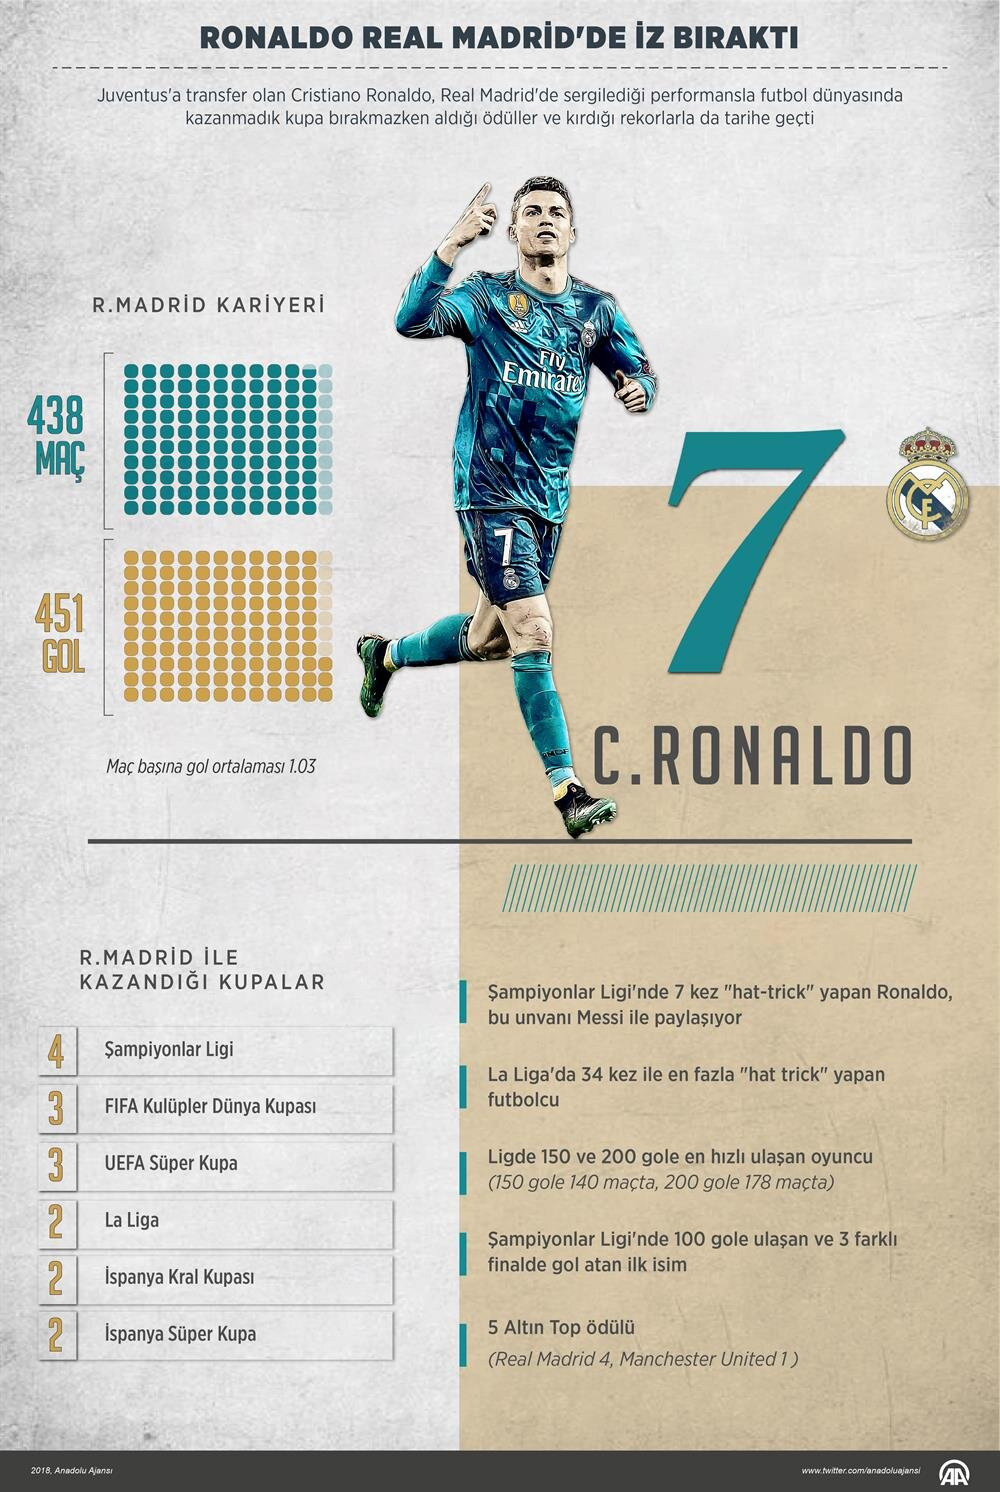 Cristiano Ronaldo'nun Real Madrid kariyeri.